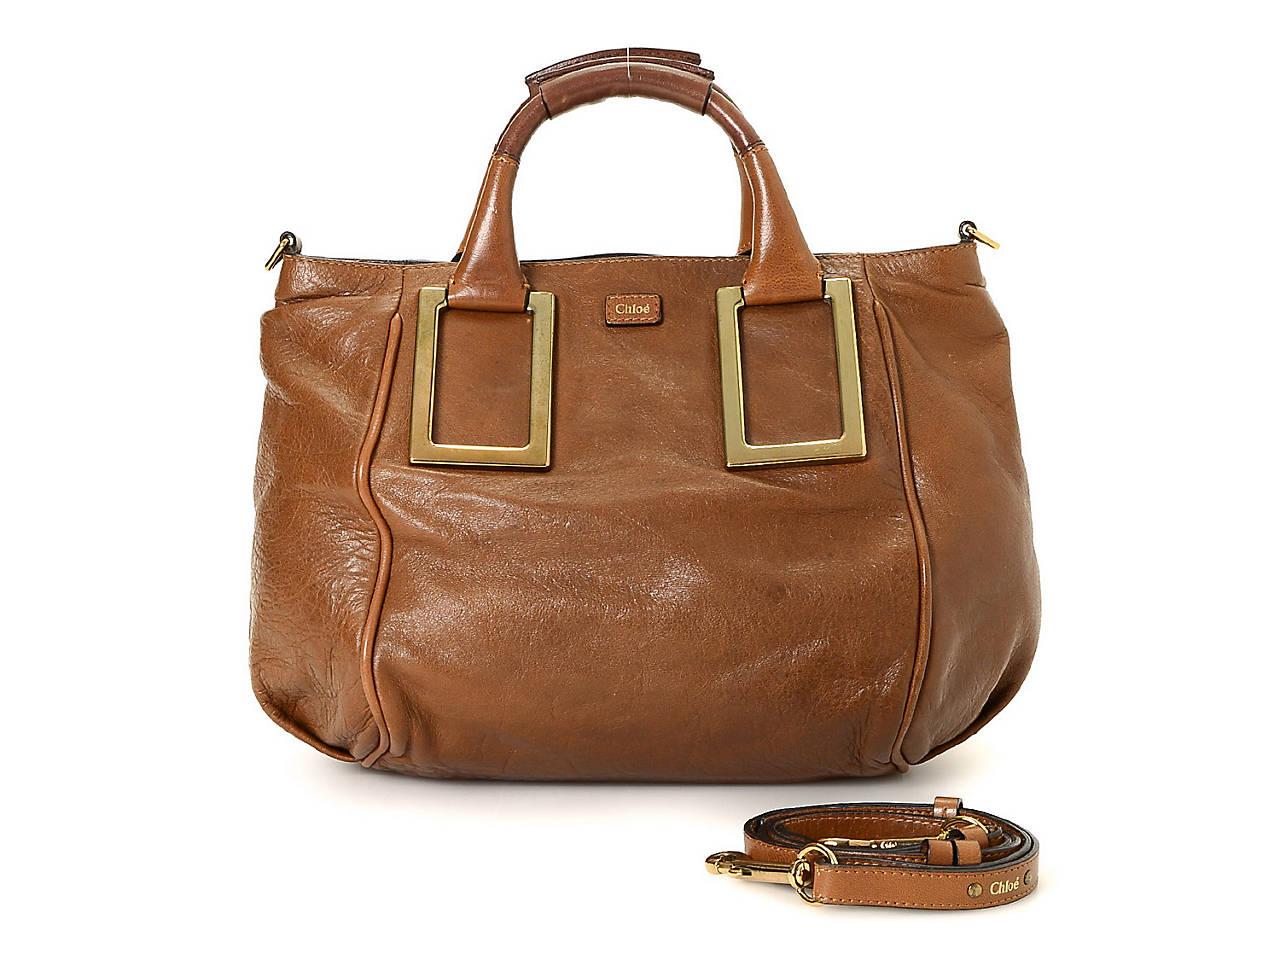 Chloe - Vintage Luxury Ethel Leather Satchel Women s Handbags ... 2df754610